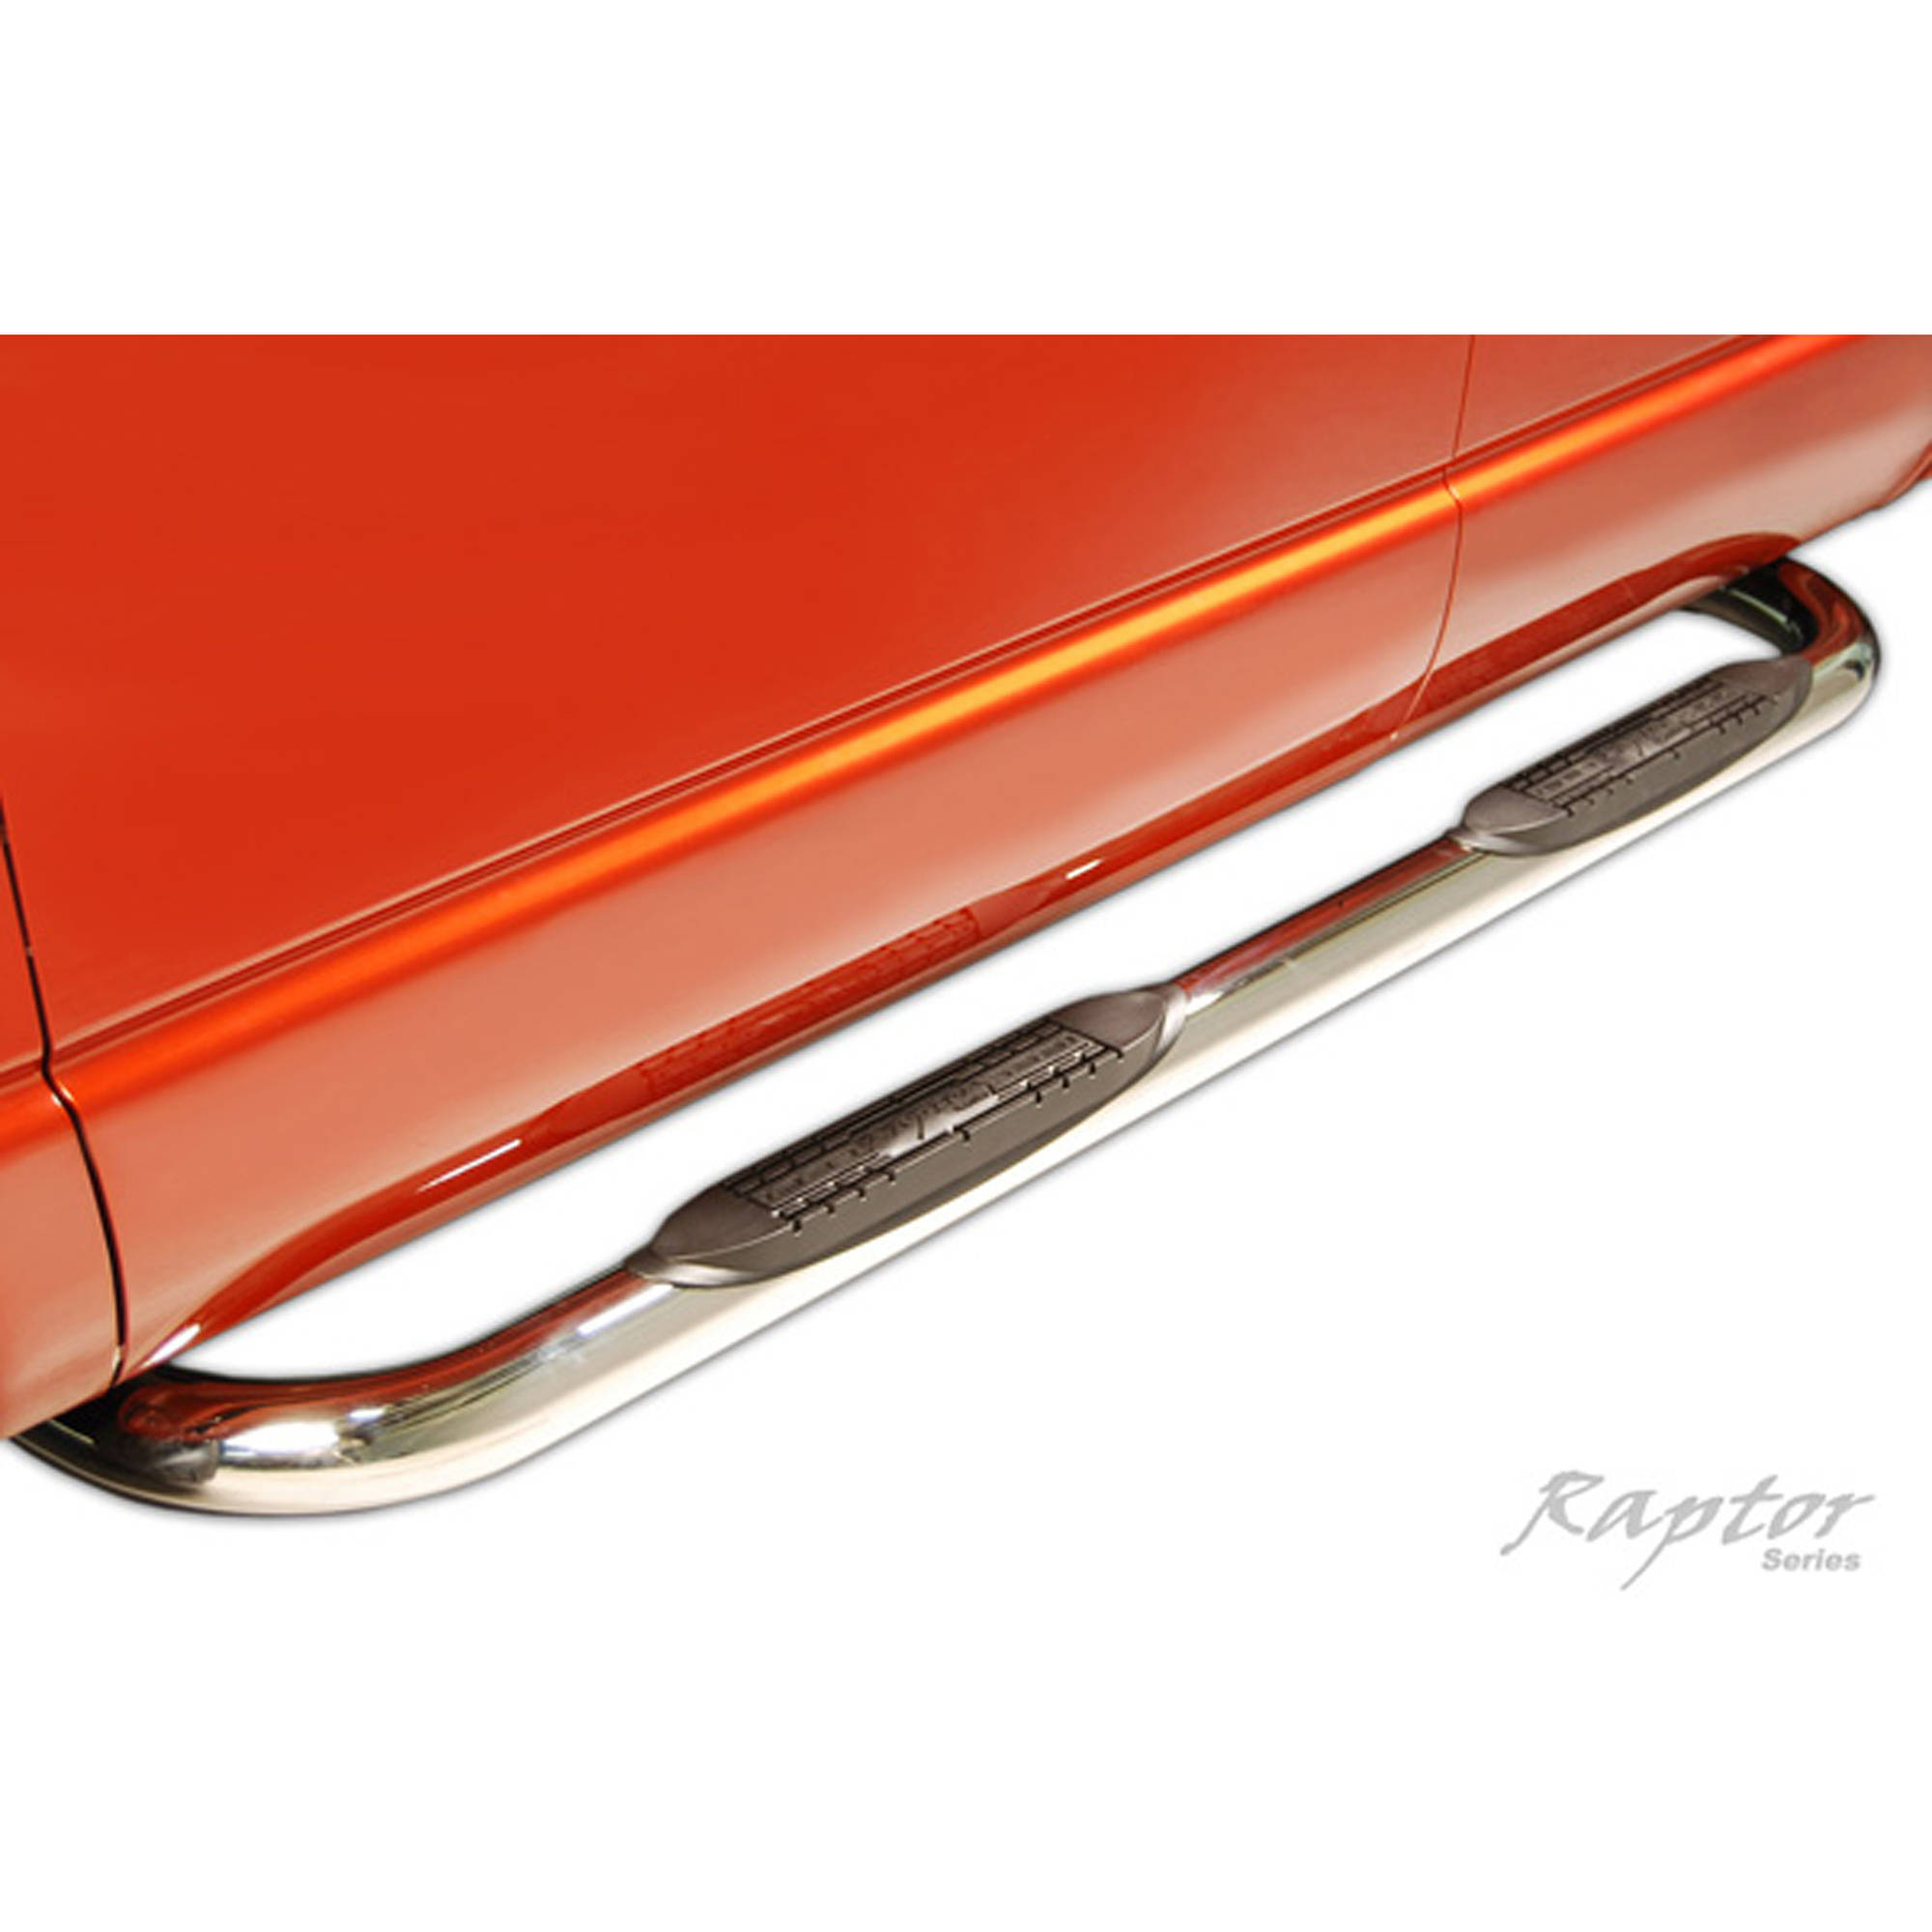 "Raptor Series 00-04 Dodge Dakota Quad Cab 3"" Round Side Steps, Stainless Steel"